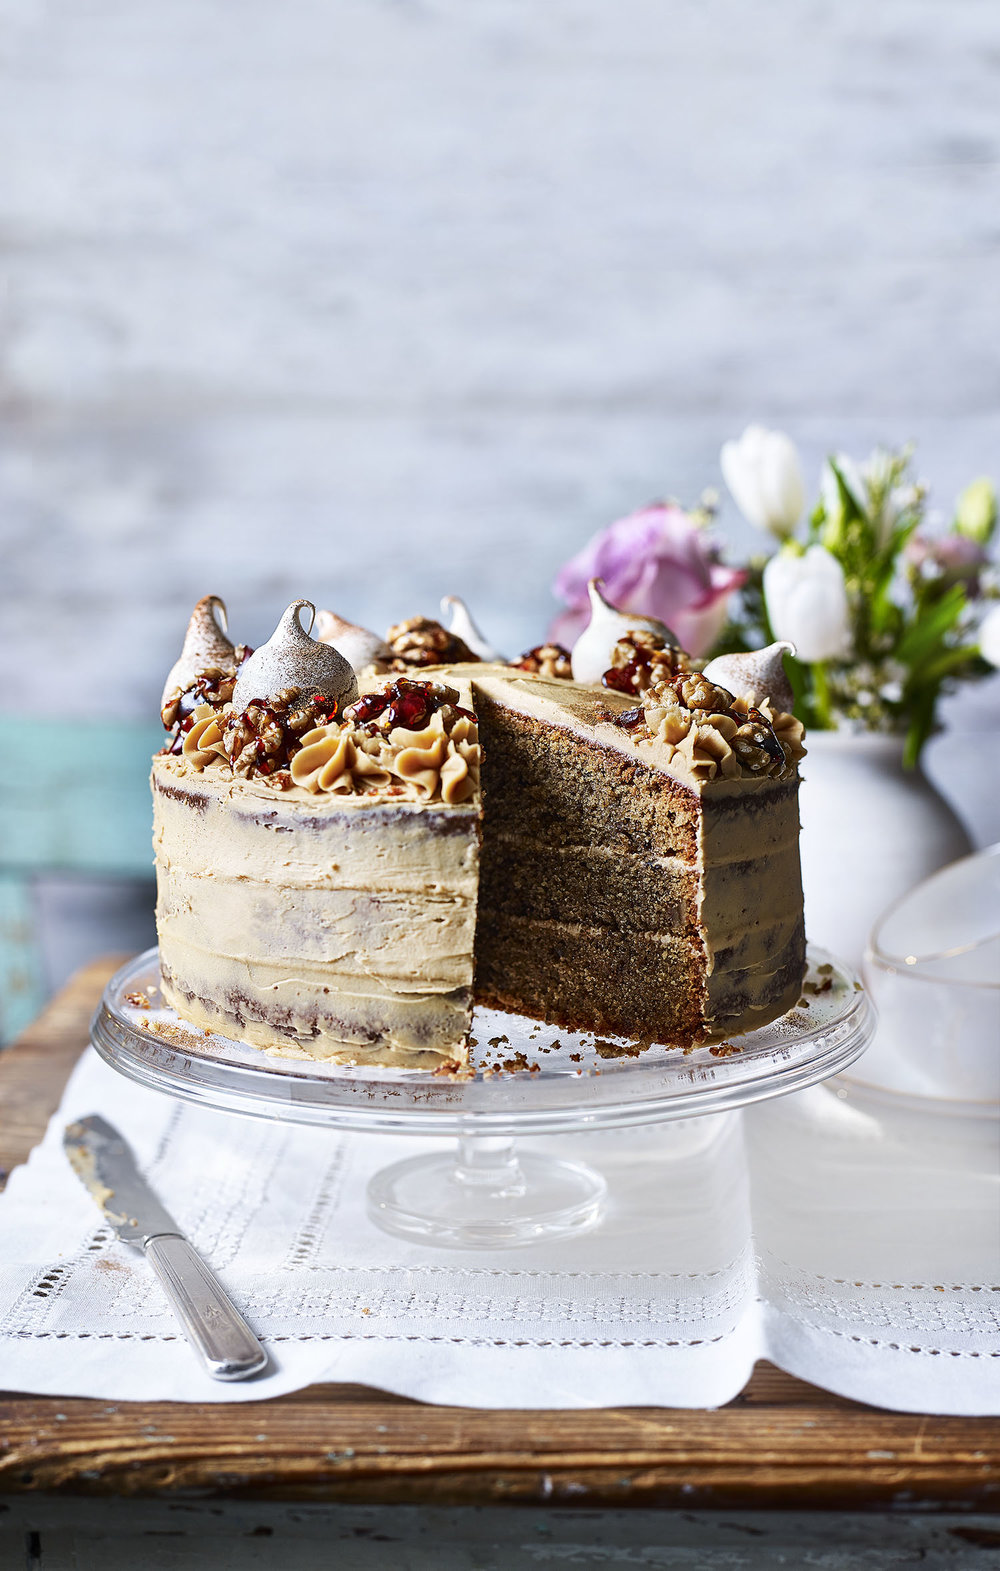 Coffee & Walnut Cake Photograph Toby Scott Prop Styling Davina Perkins Recipe Lizzie Fox